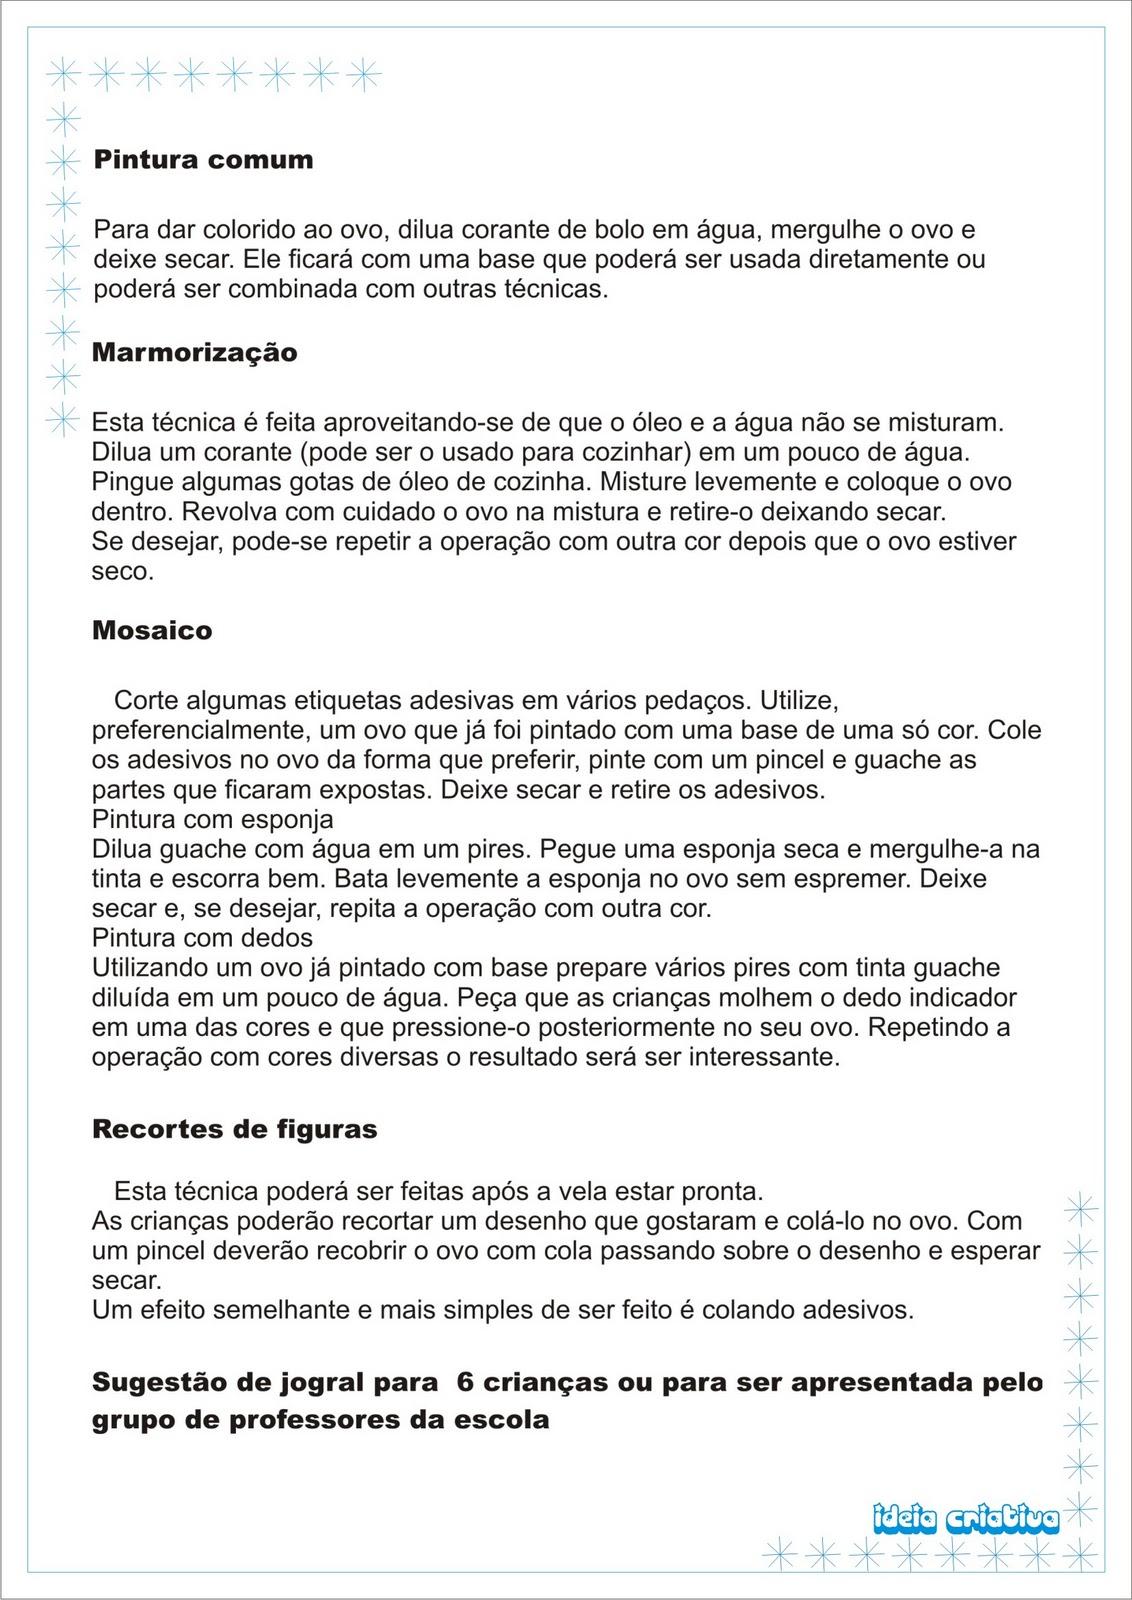 Super Projeto Páscoa Ideia Criativa | Ideia Criativa - Gi Barbosa  RI72